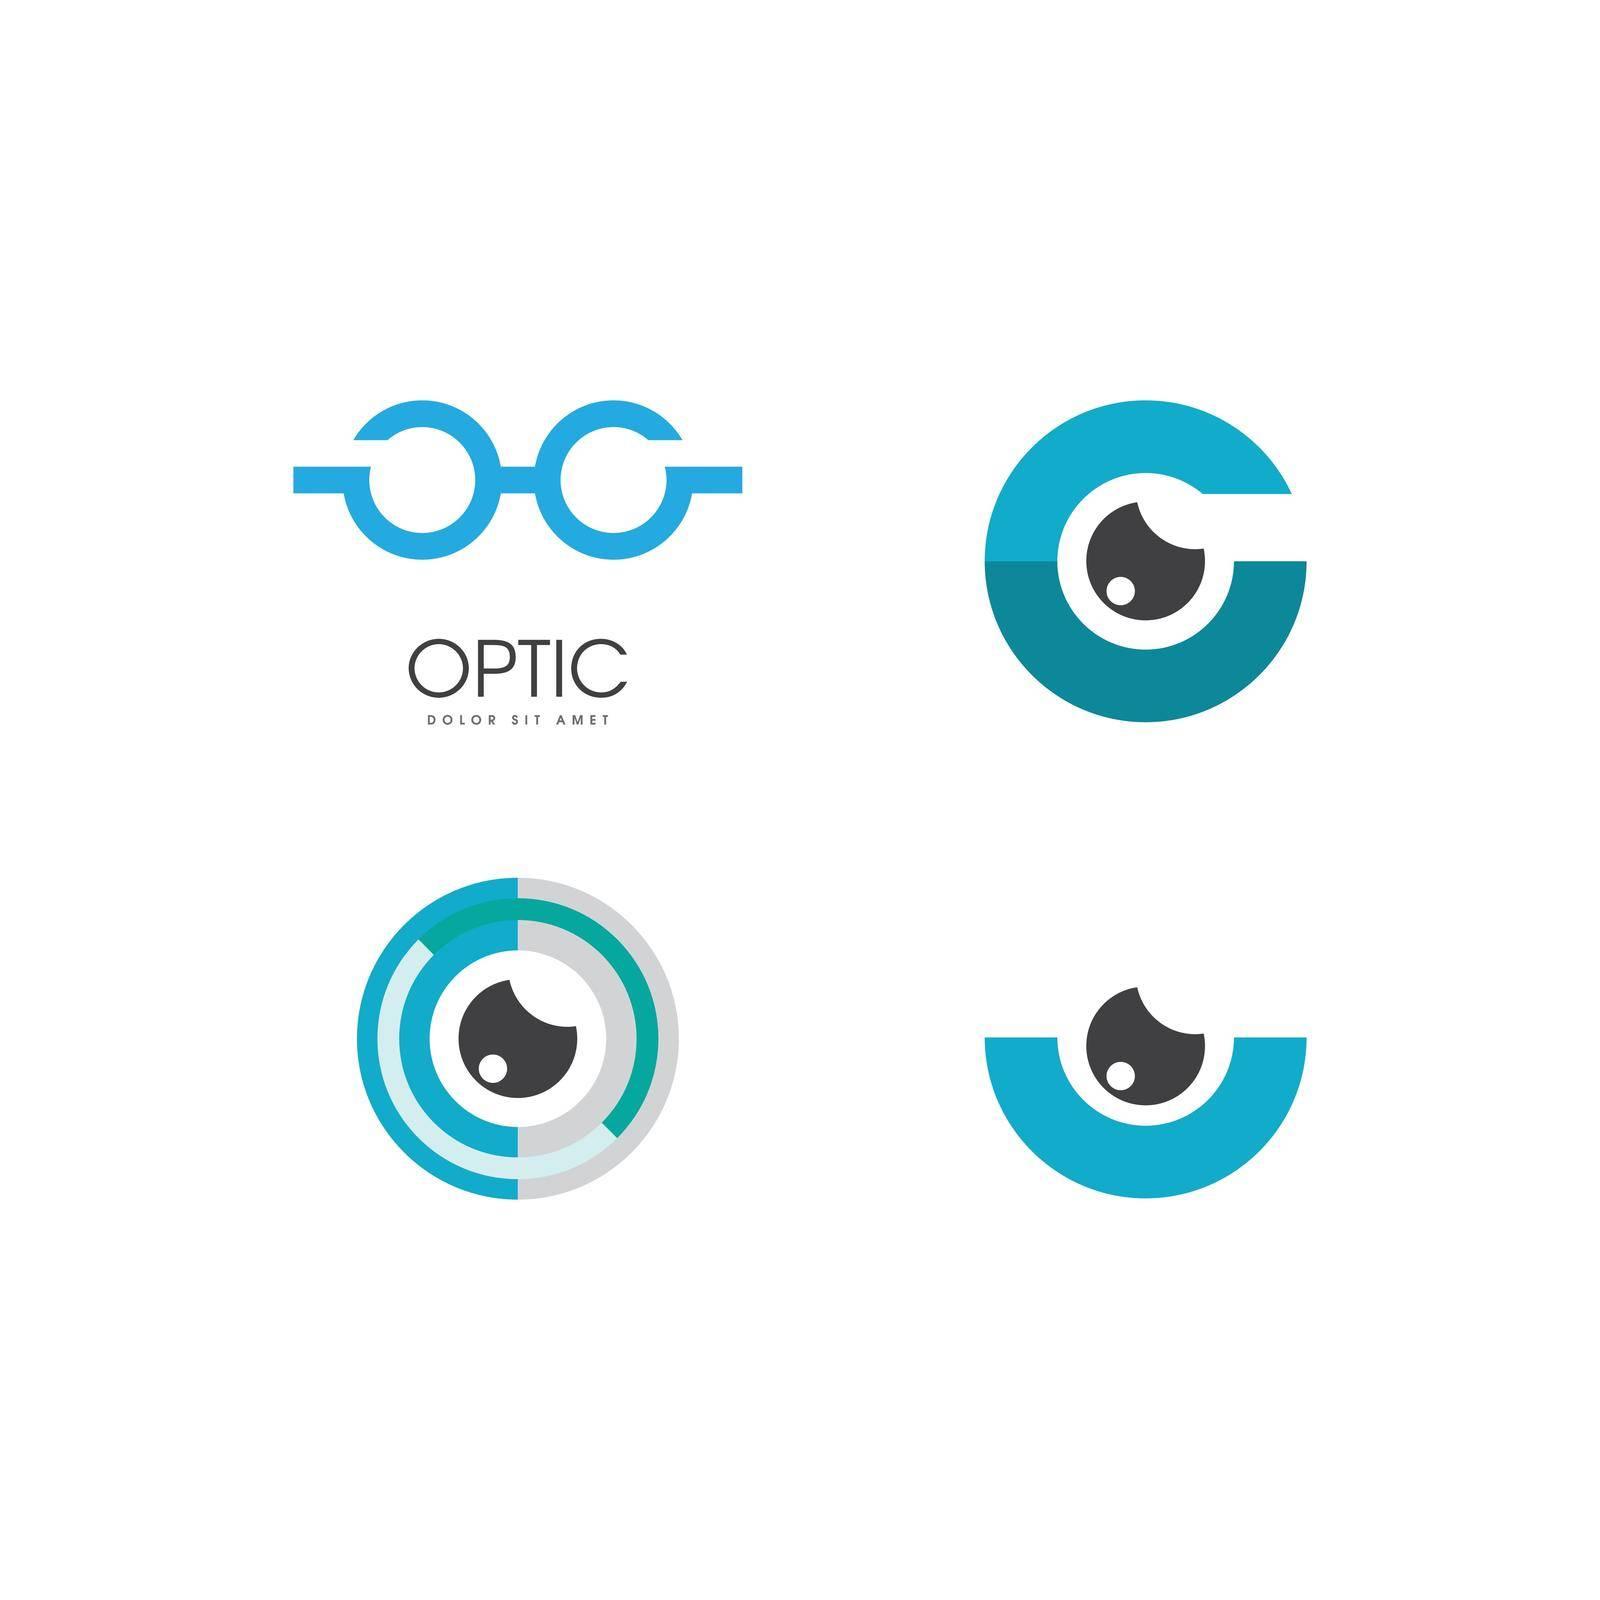 Optic logo vector flat design